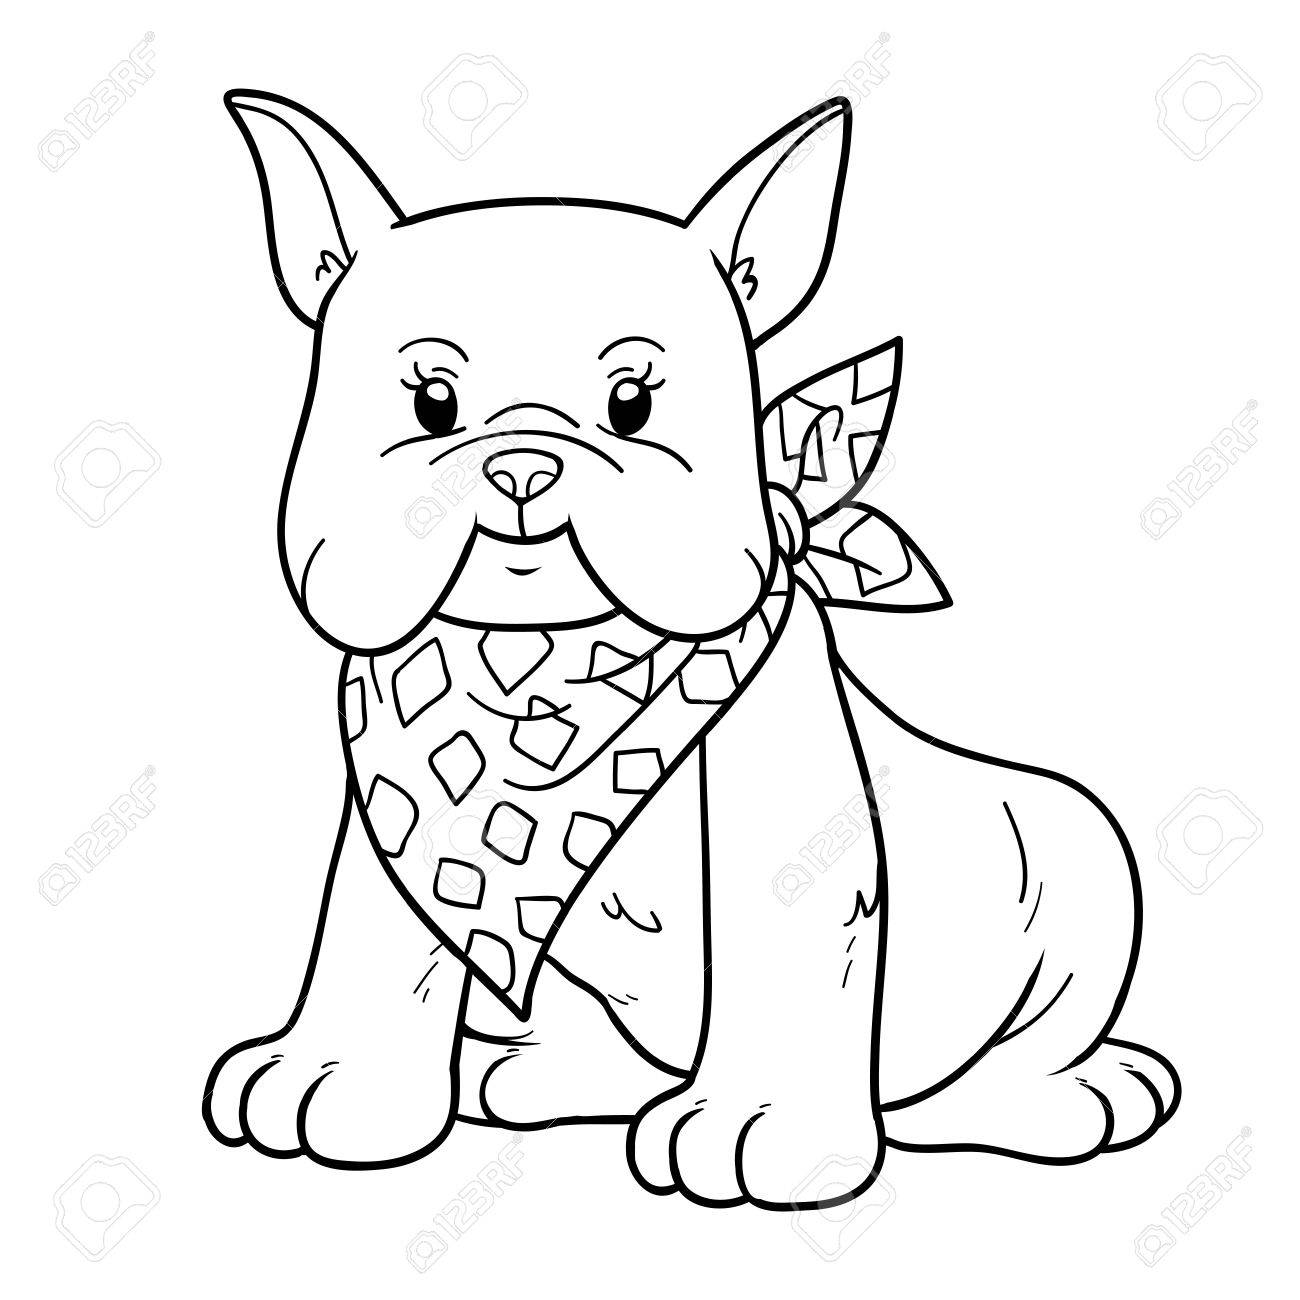 Coloring Book For Children (french Bulldog) Royalty Free Clip Artok ... b0ca4b9a14